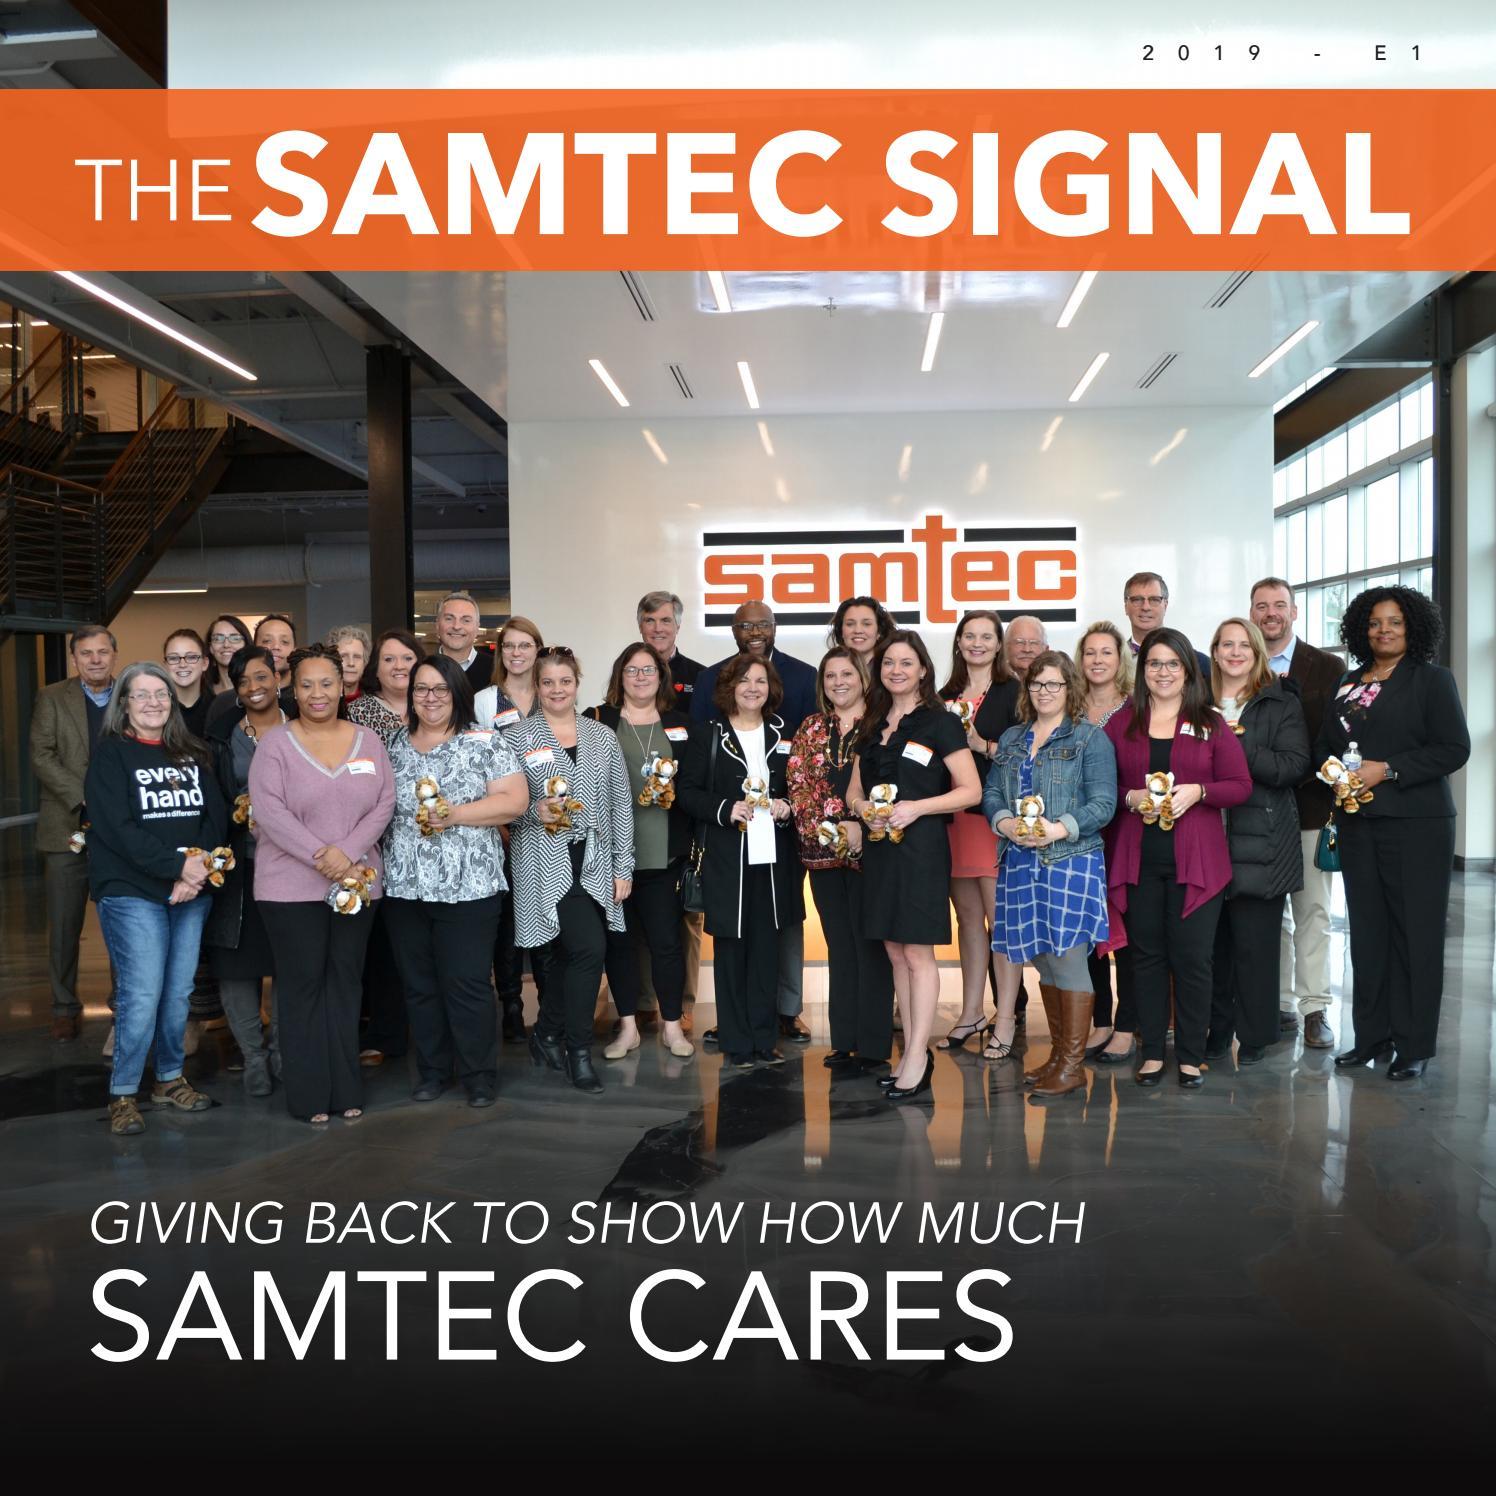 Samtec Signal E1 2019 by Samtec Inc  - issuu